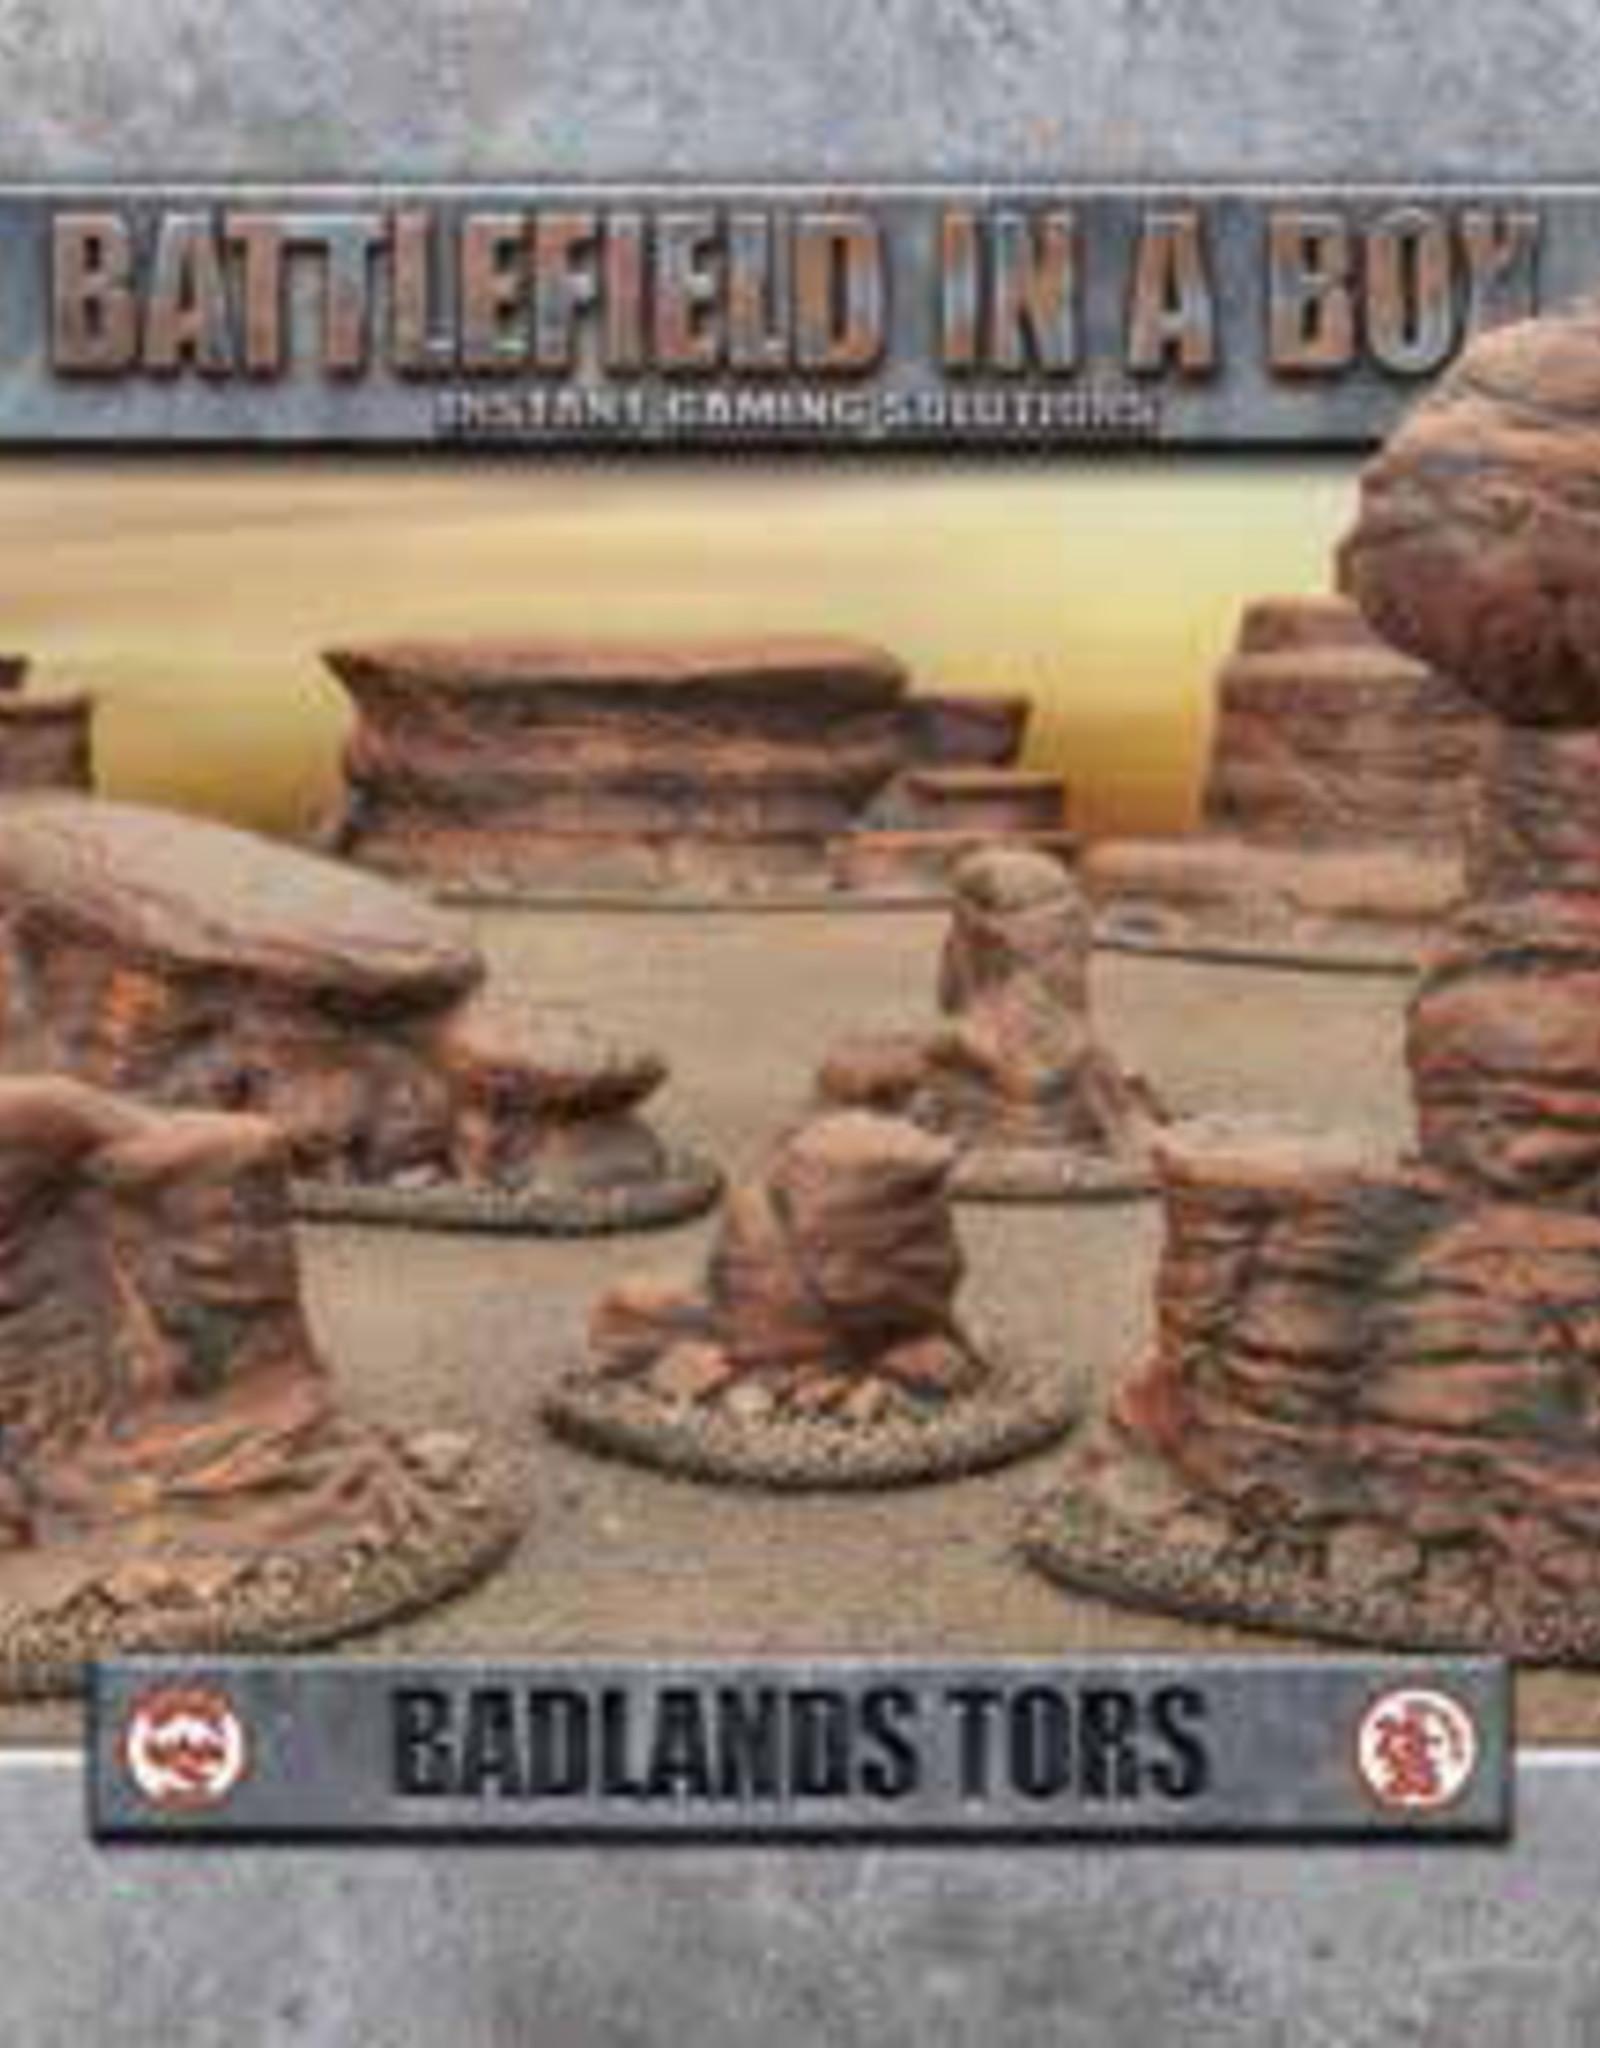 Battlefront Miniatures Battlefield in a Box: Badlands- Tors